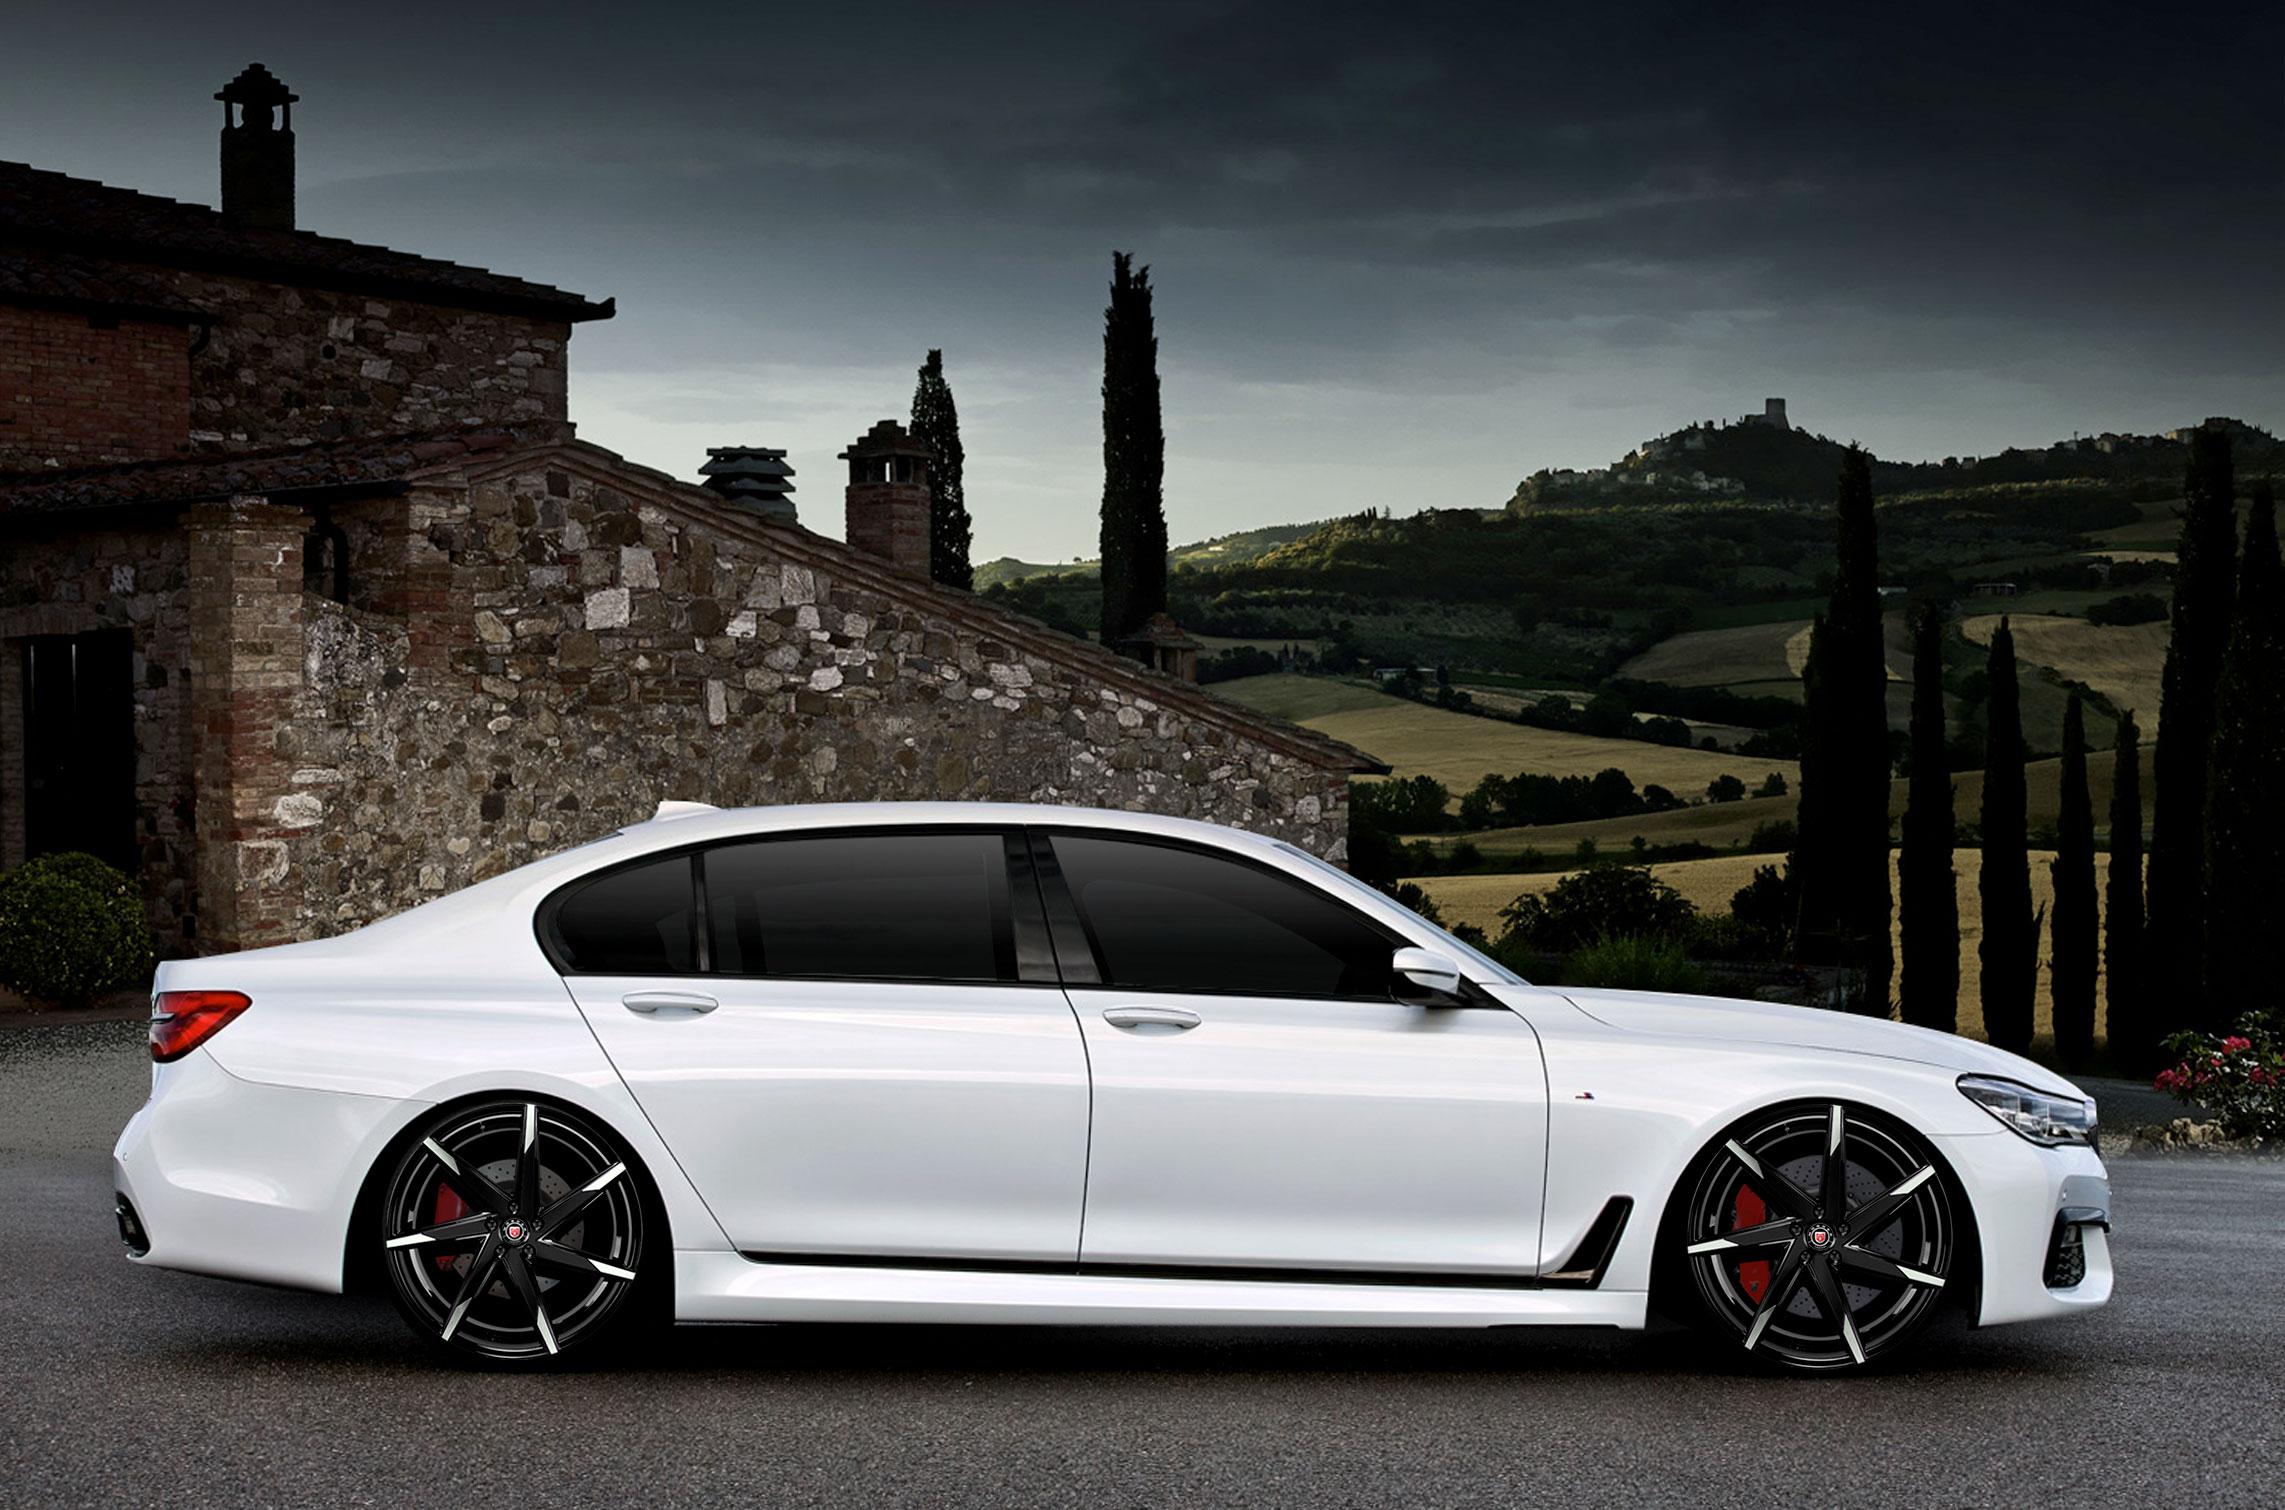 BMW 7 Series With MS 007 Custom Wheels